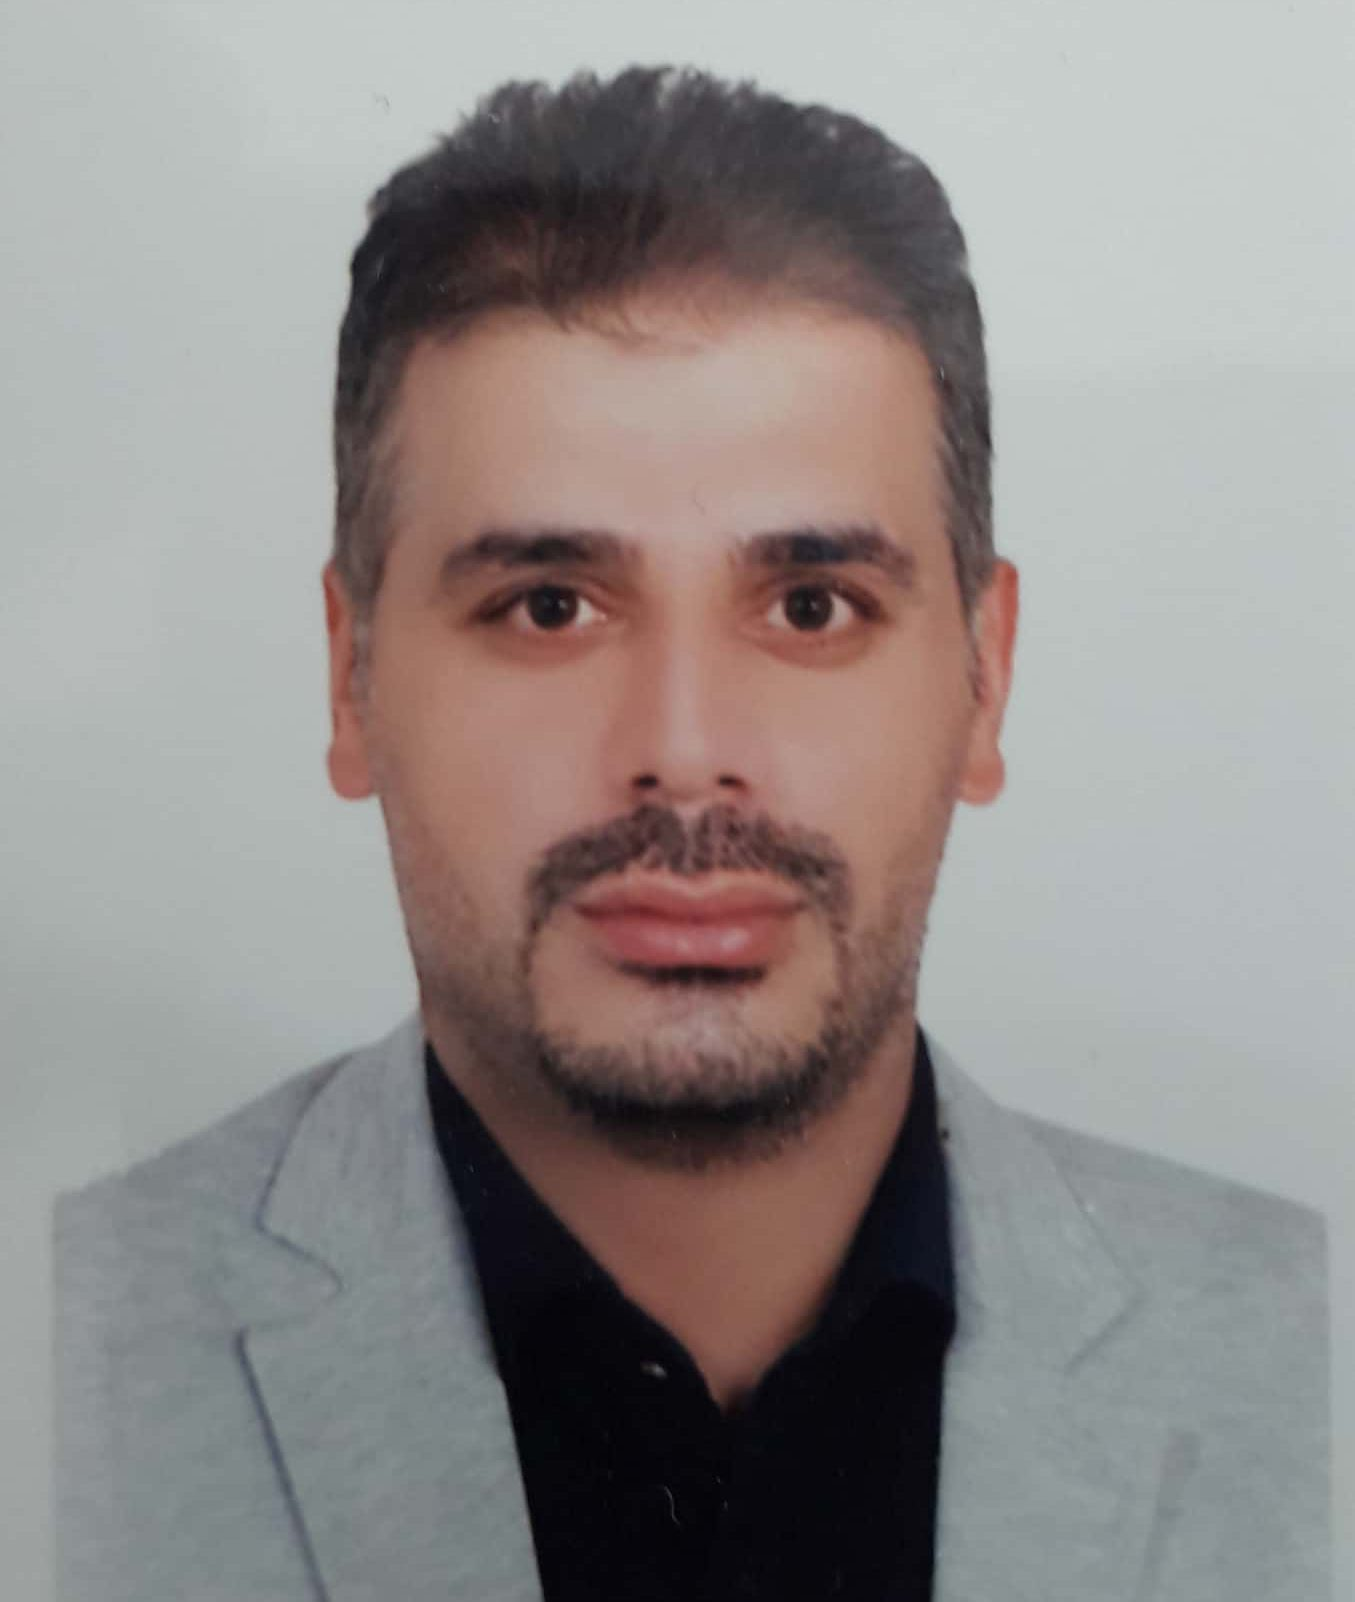 دکتر مقداد عبداله پور علی تپه مدیر پژوهشی